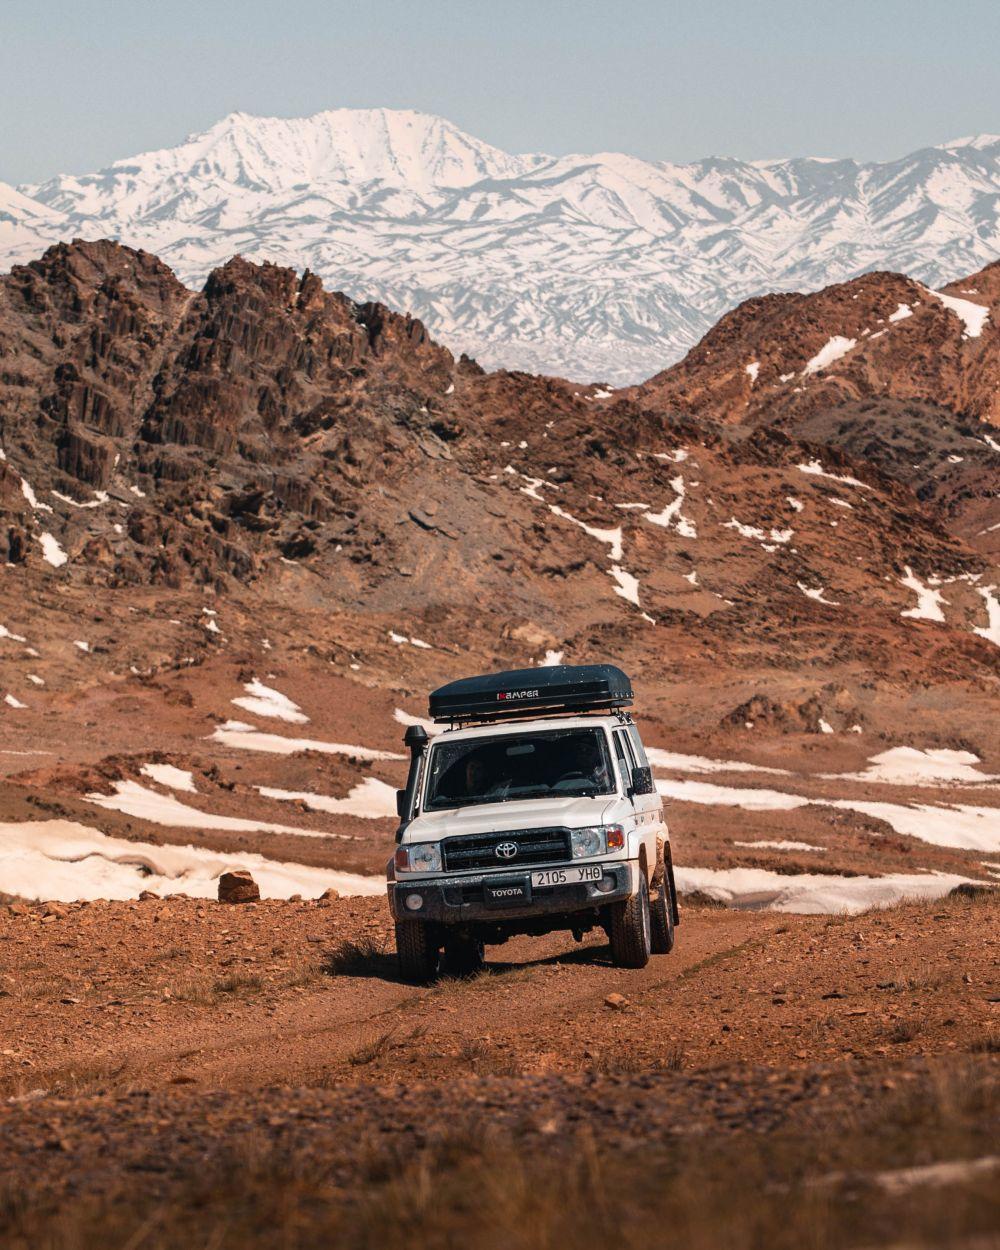 Follow the Tracks Camel Route Tour